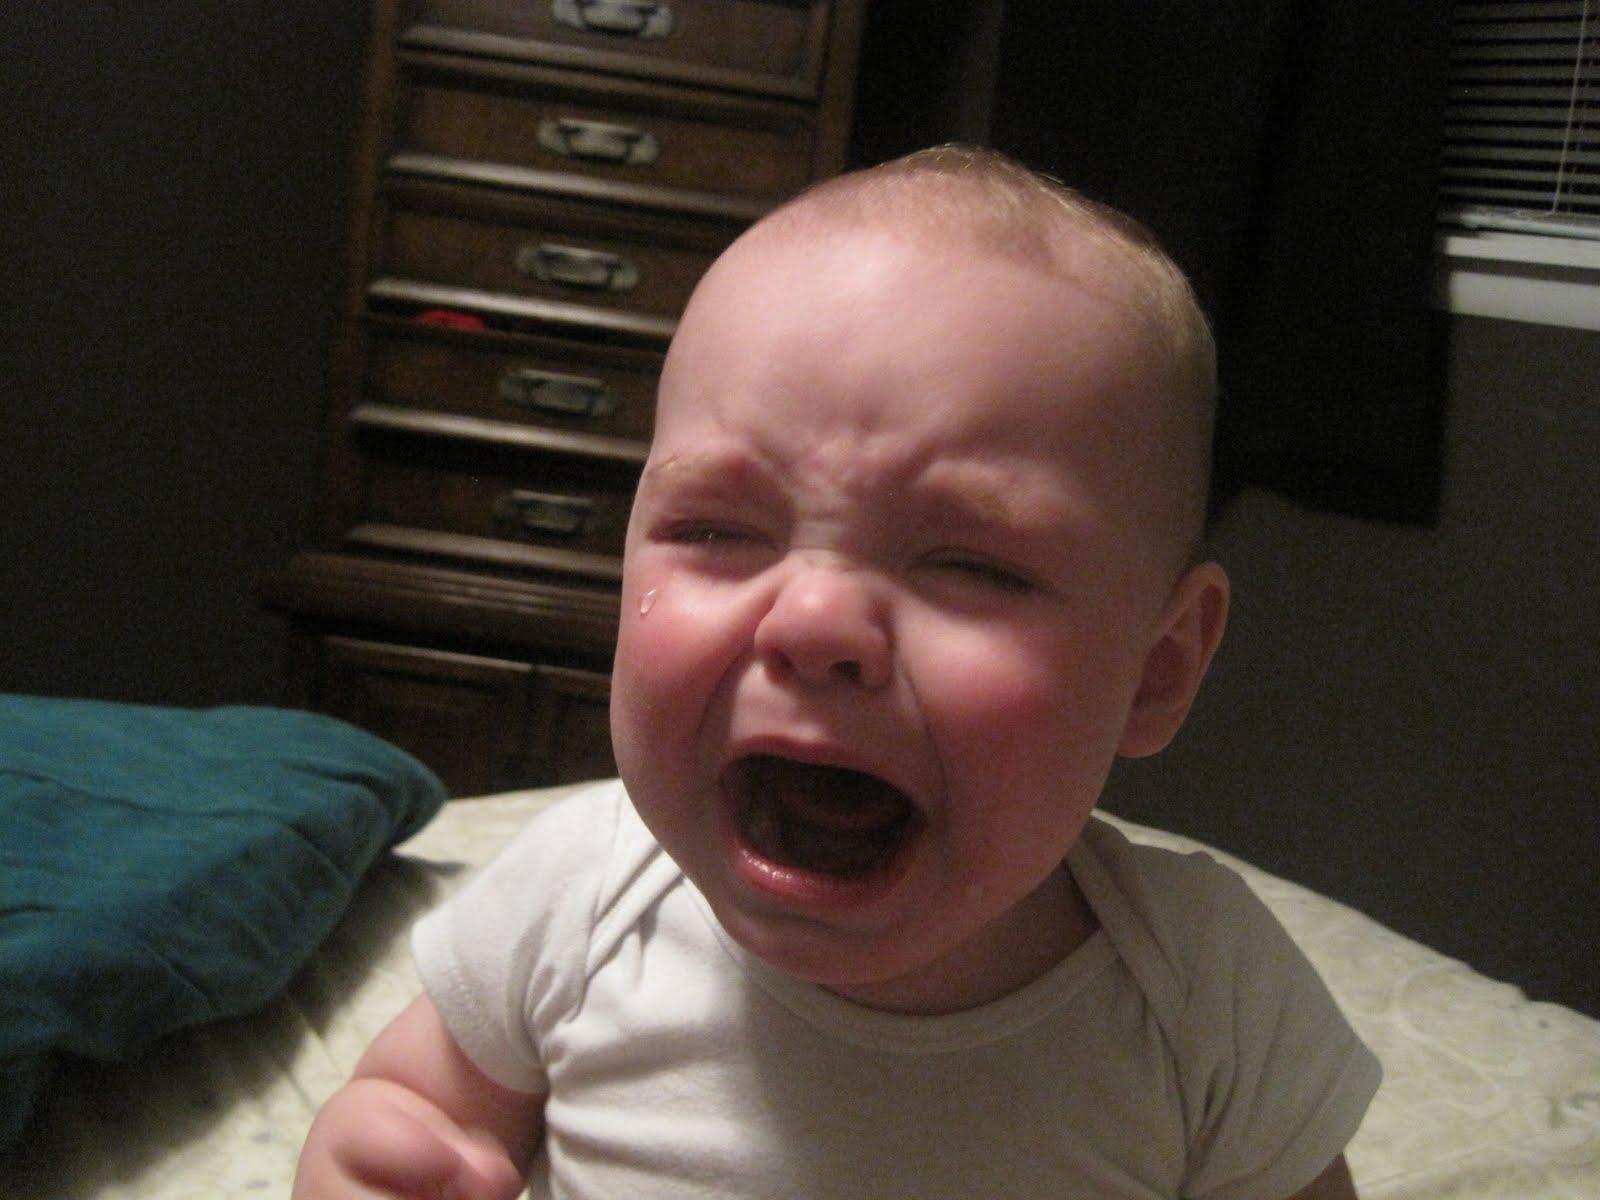 Baby Kyler Sad Baby Face